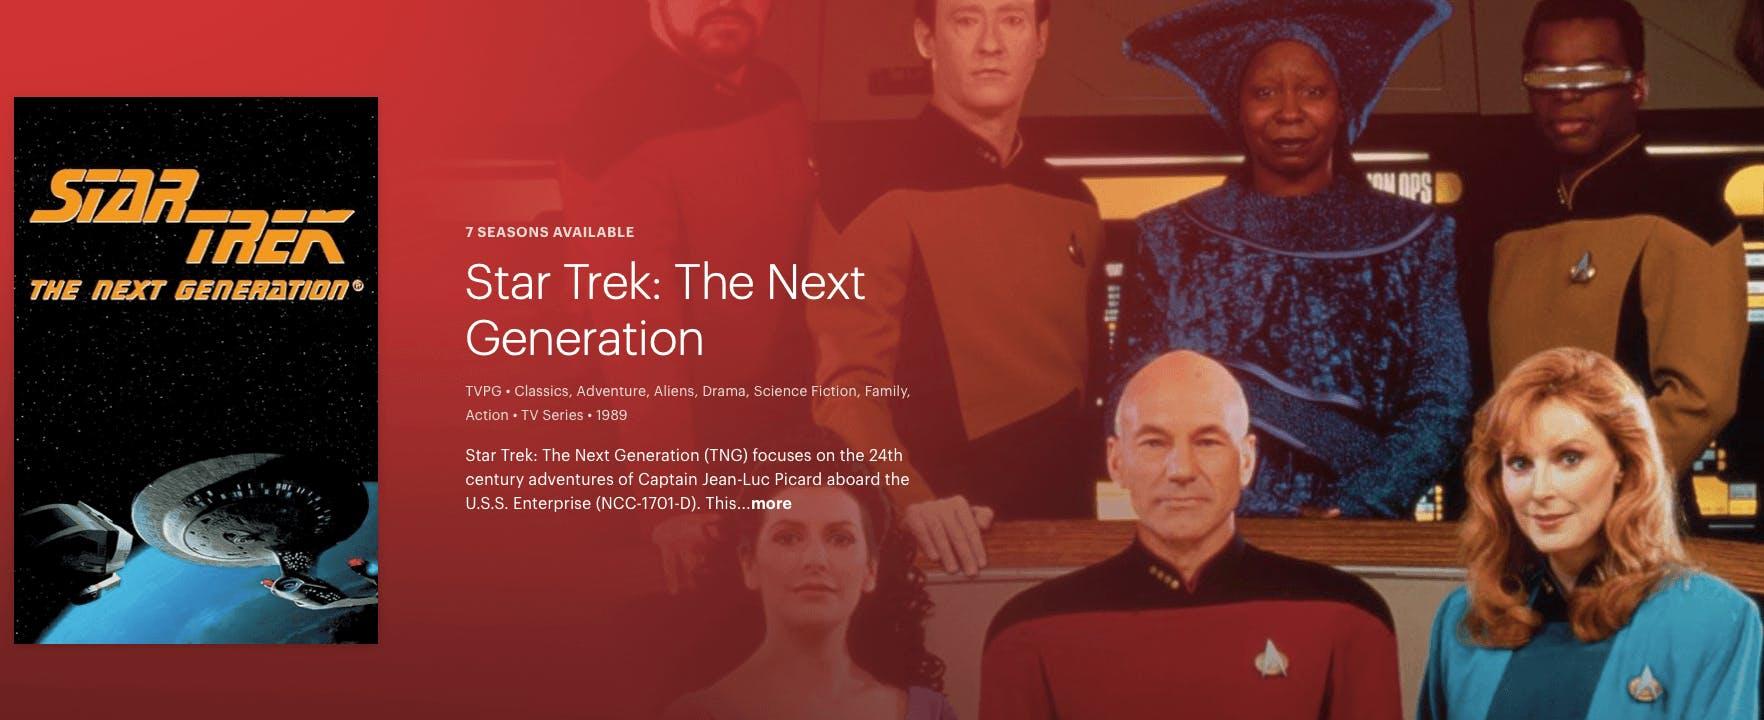 watch Star Trek the next generation on Hulu